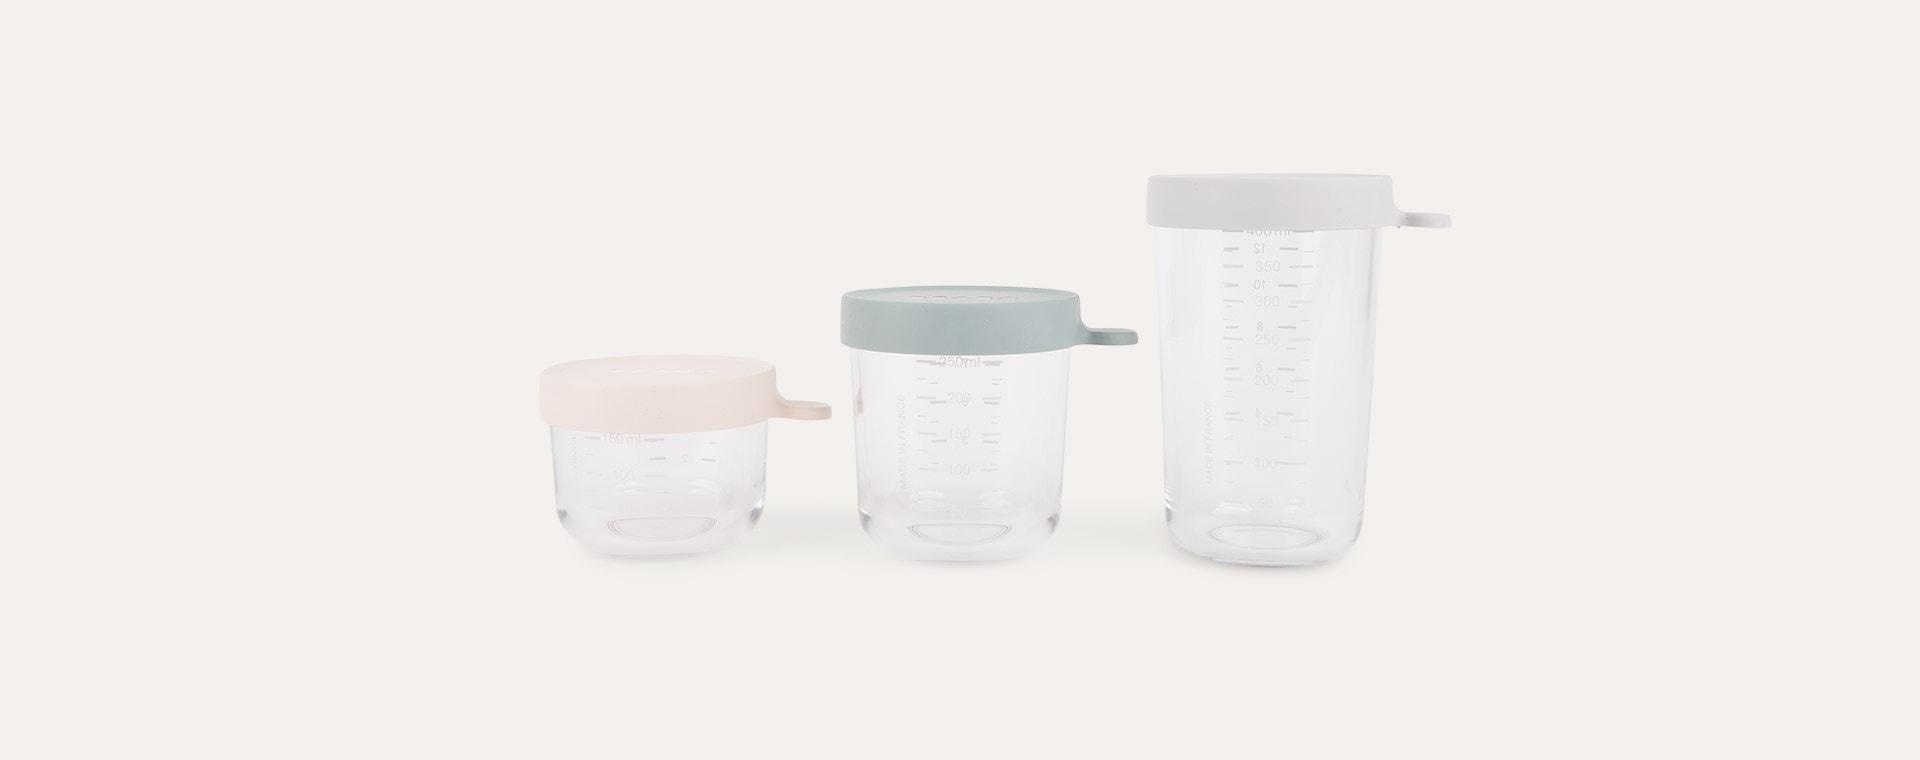 Pink / Eucalyptus Green / Light Mist Beaba Set of 3 Glass Storage Jars